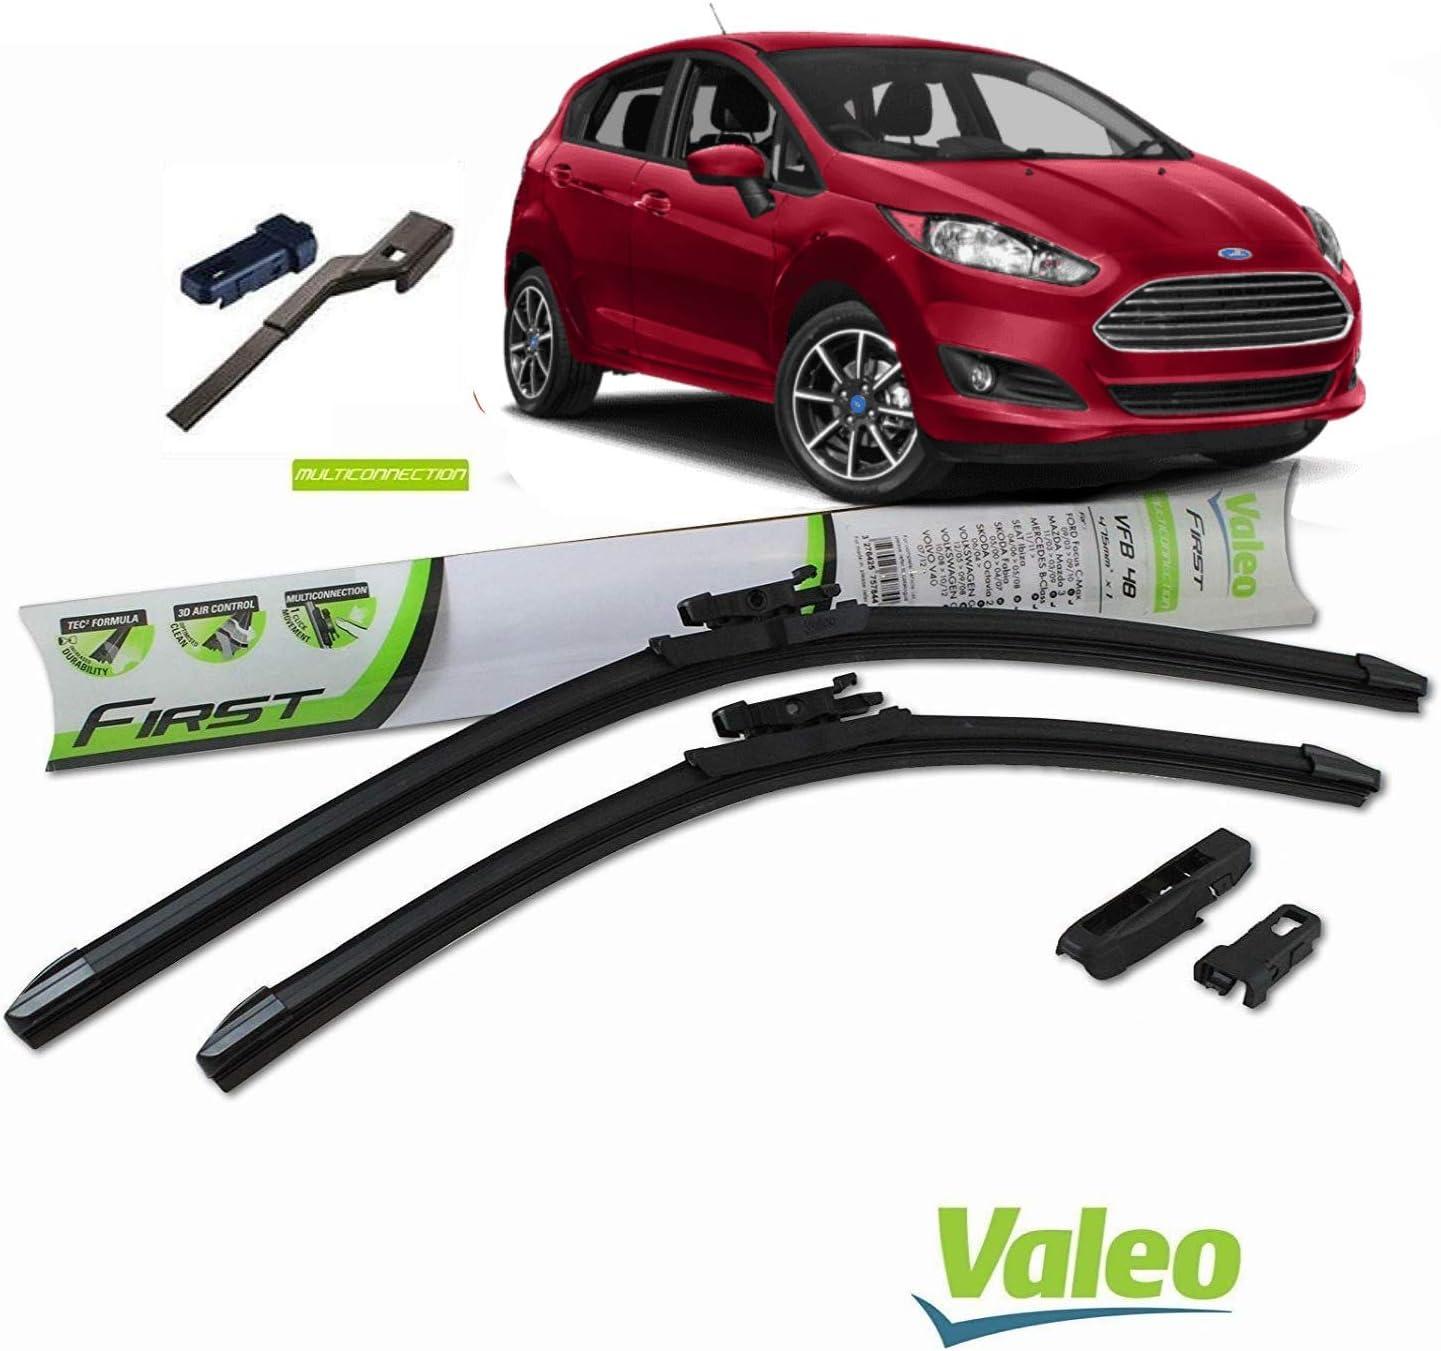 Valeo_group Valeo Set di 2 spazzole tergicristalli Speciali per